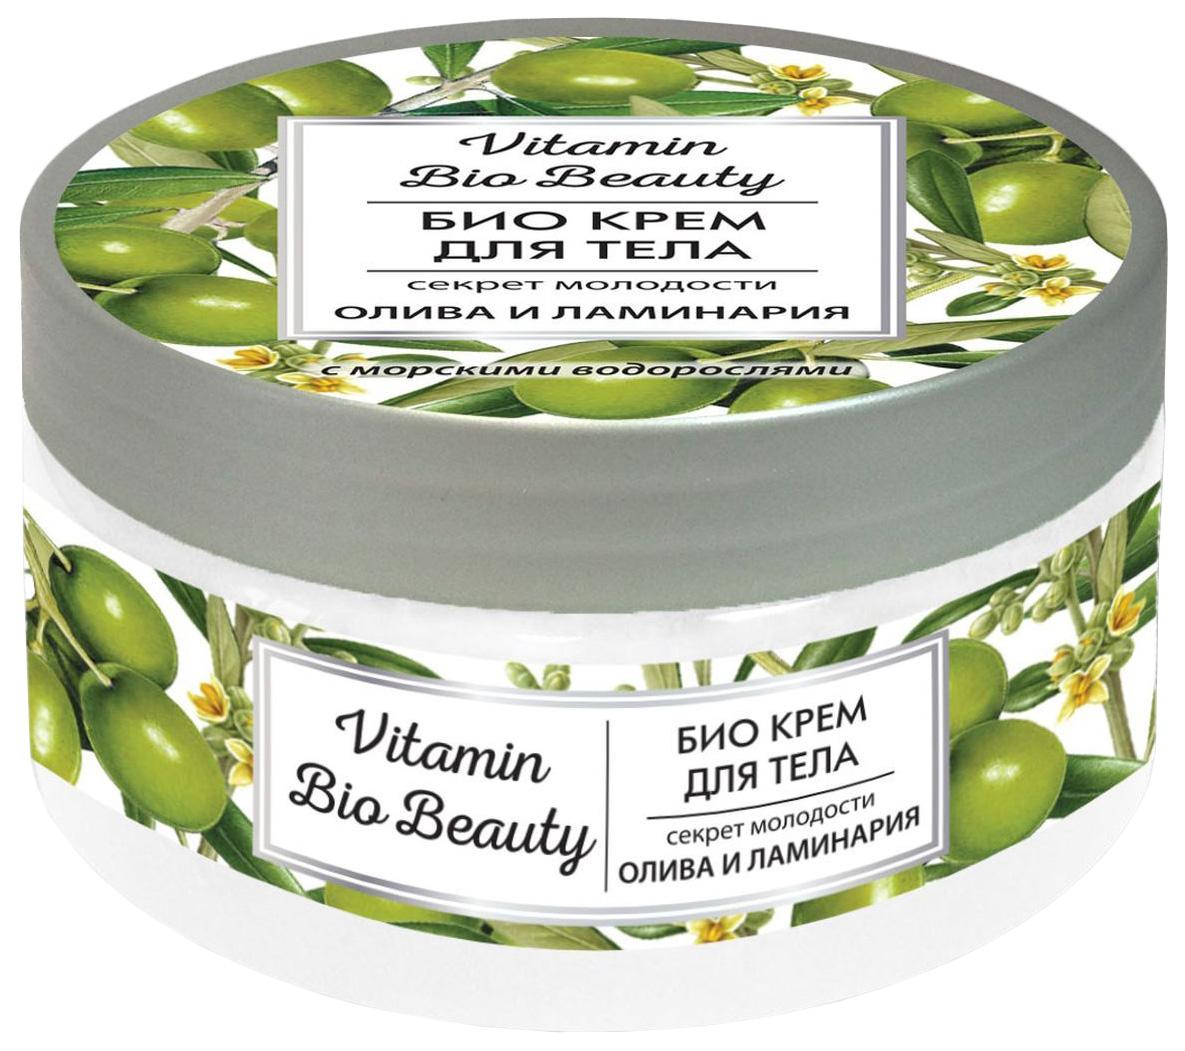 Крем для тела Vitamin Bio Beauty Олива и ламинария 250 мл